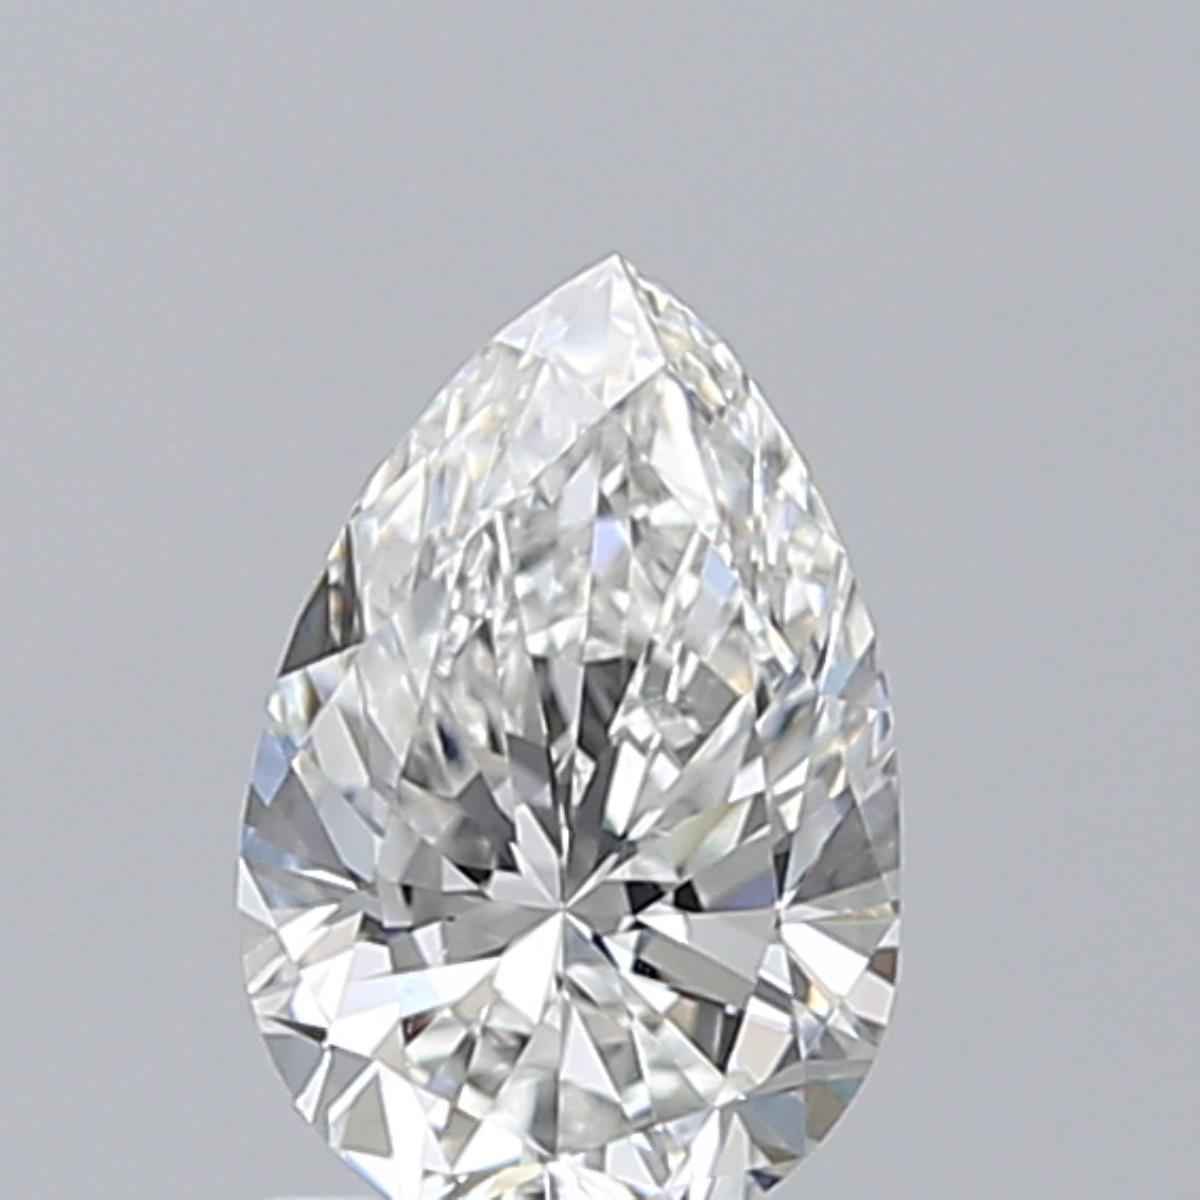 0.96-Carat Natural Ideally Cut Pear Diamond